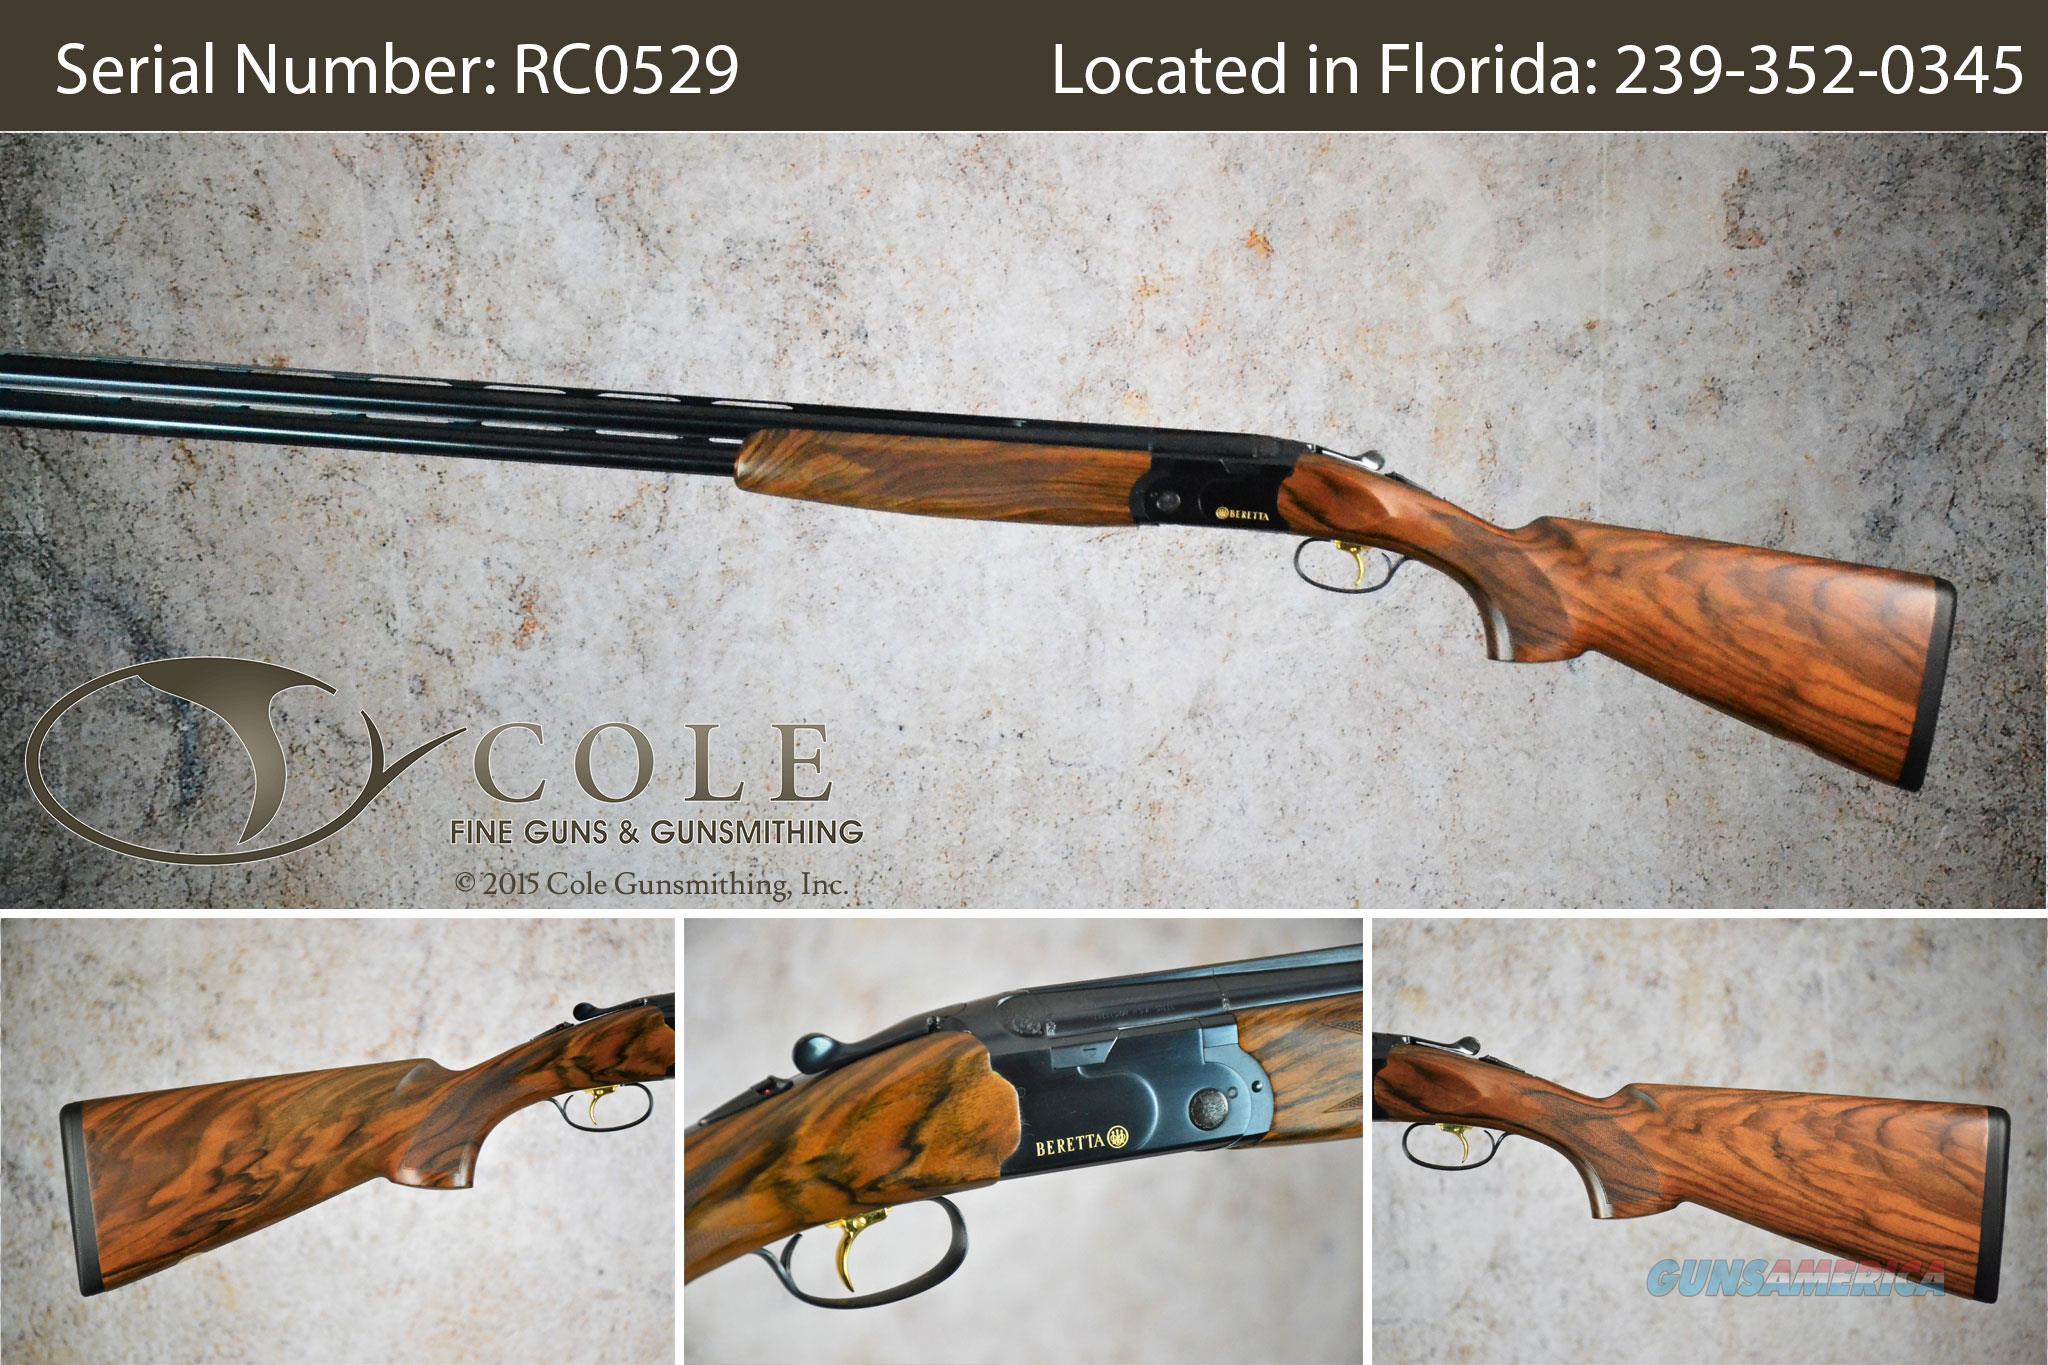 "Beretta 686 Cole Special 12ga 32"" Sporting Shotgun SN:RC0529  Guns > Shotguns > Beretta Shotguns > O/U > Trap/Skeet"